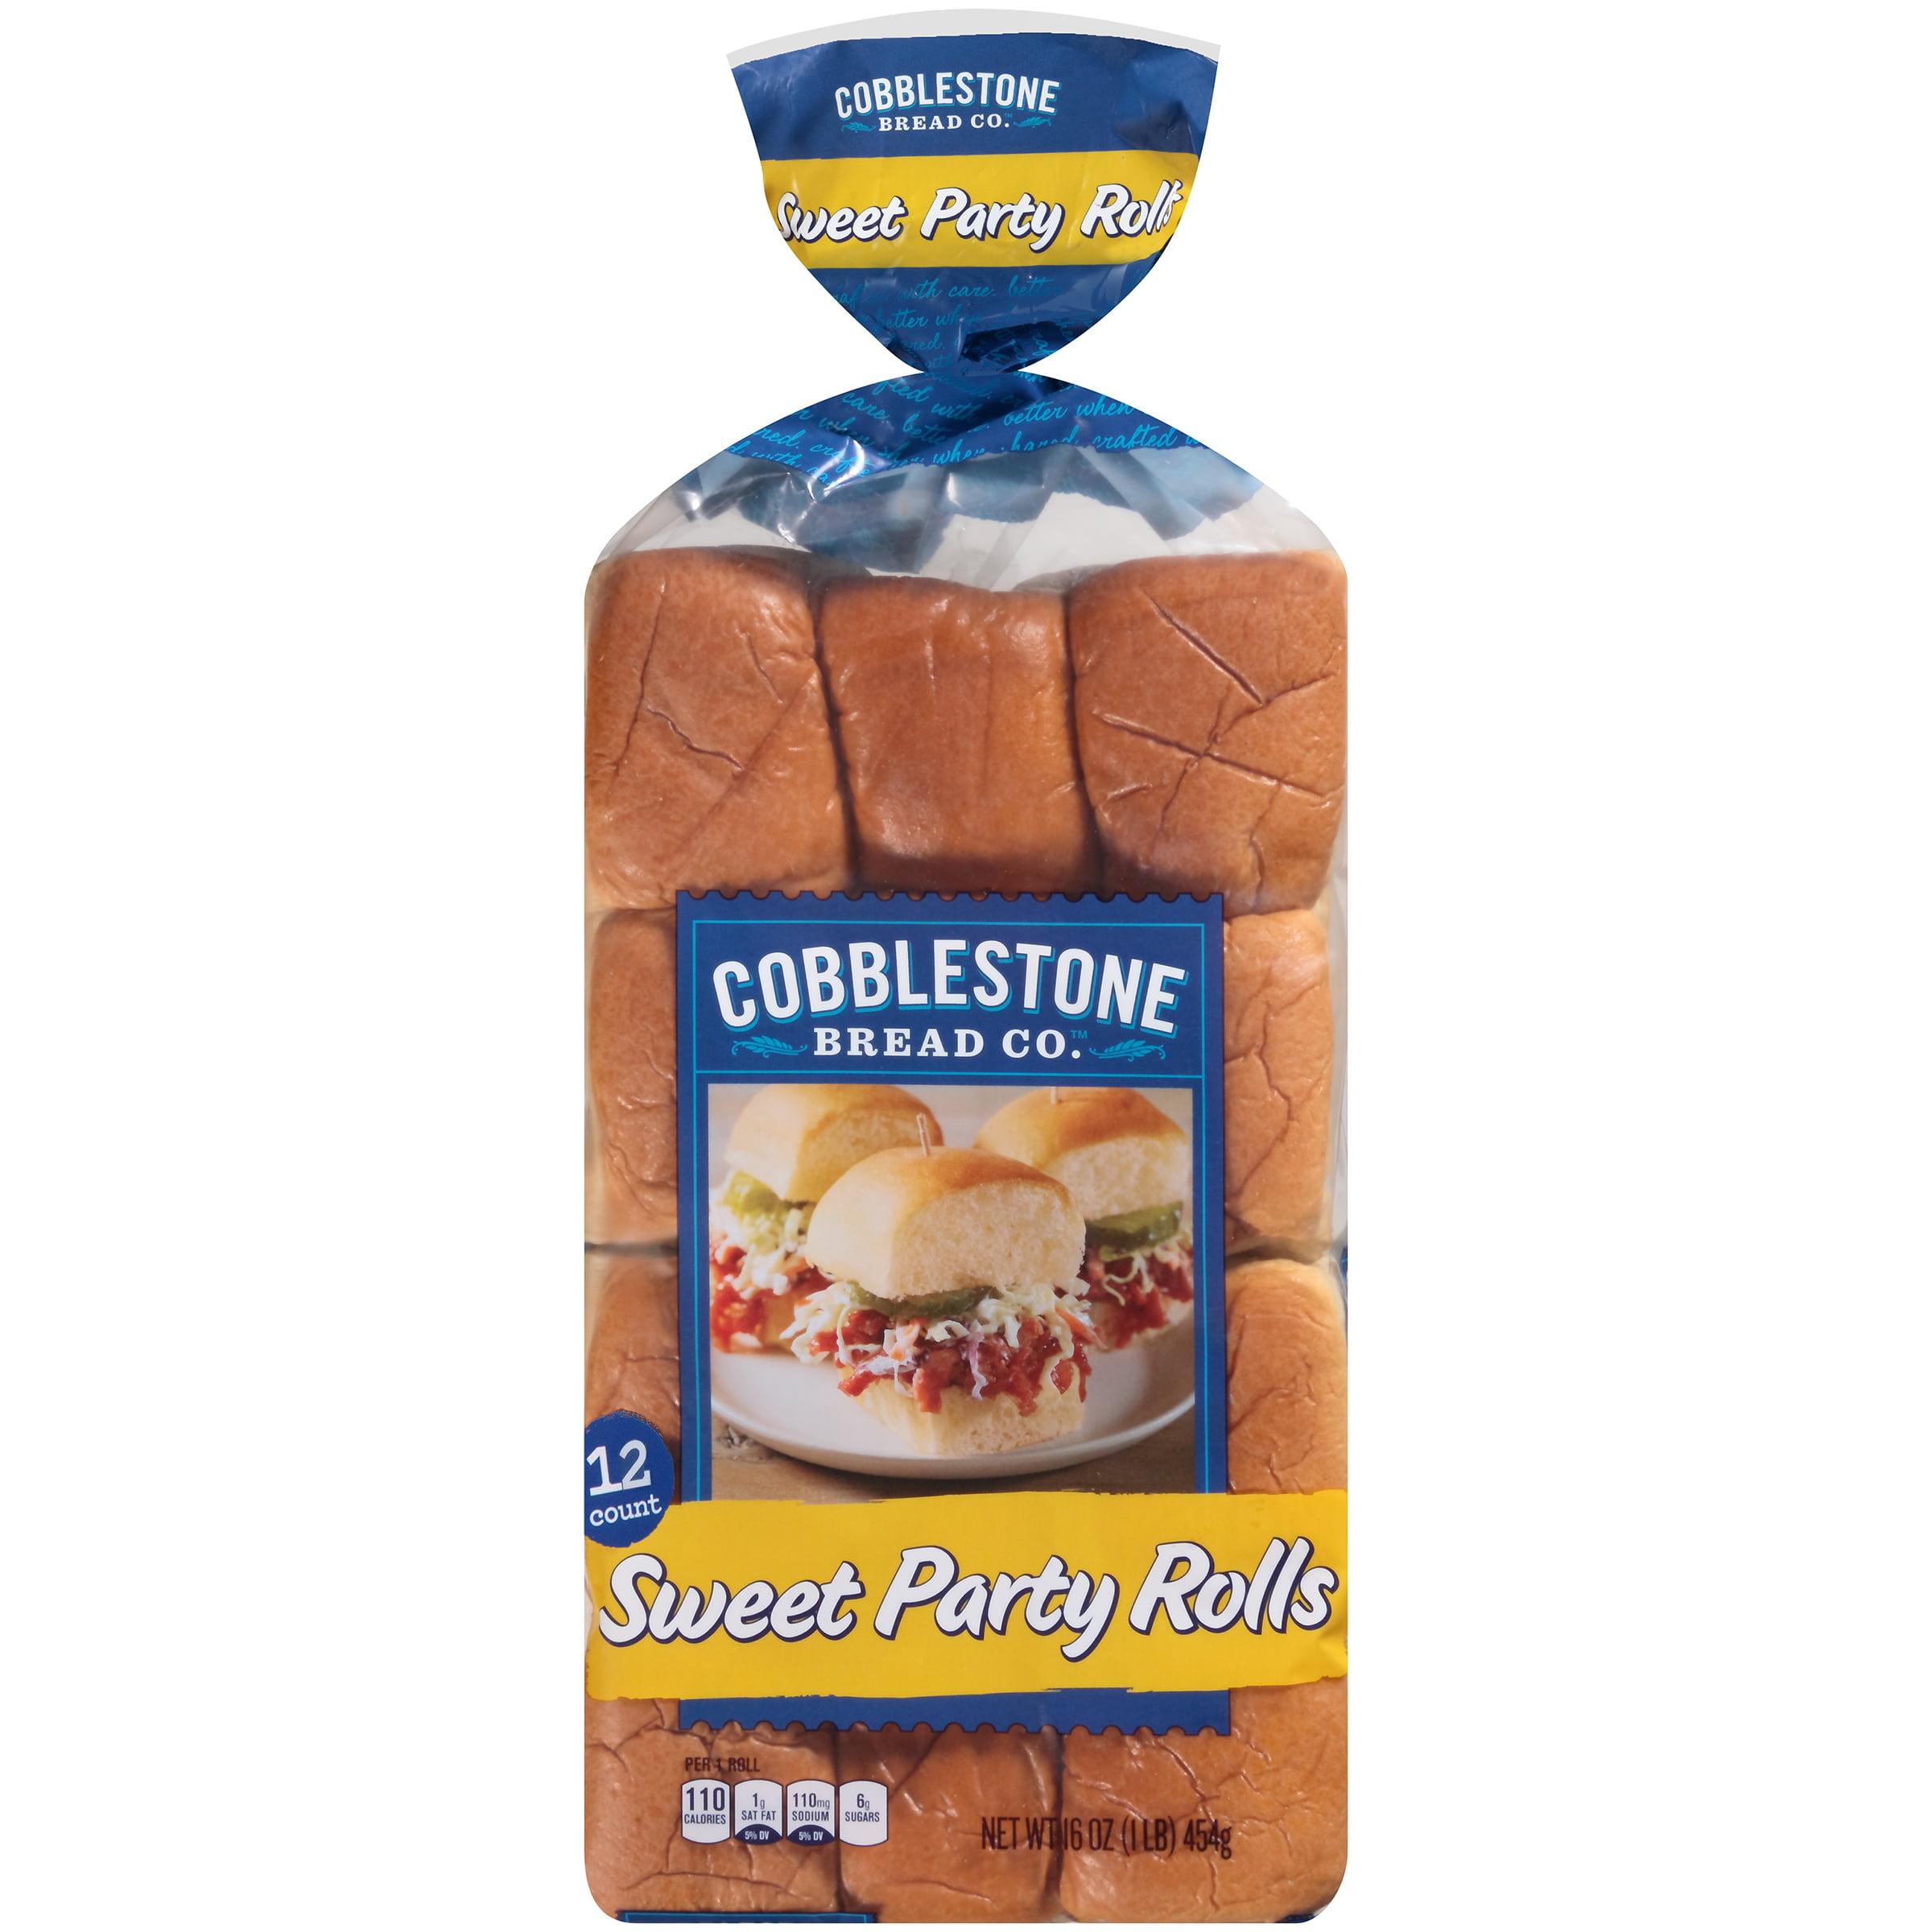 Cobblestone Bread Co.™ Sweet Party Rolls 16 oz. Bag